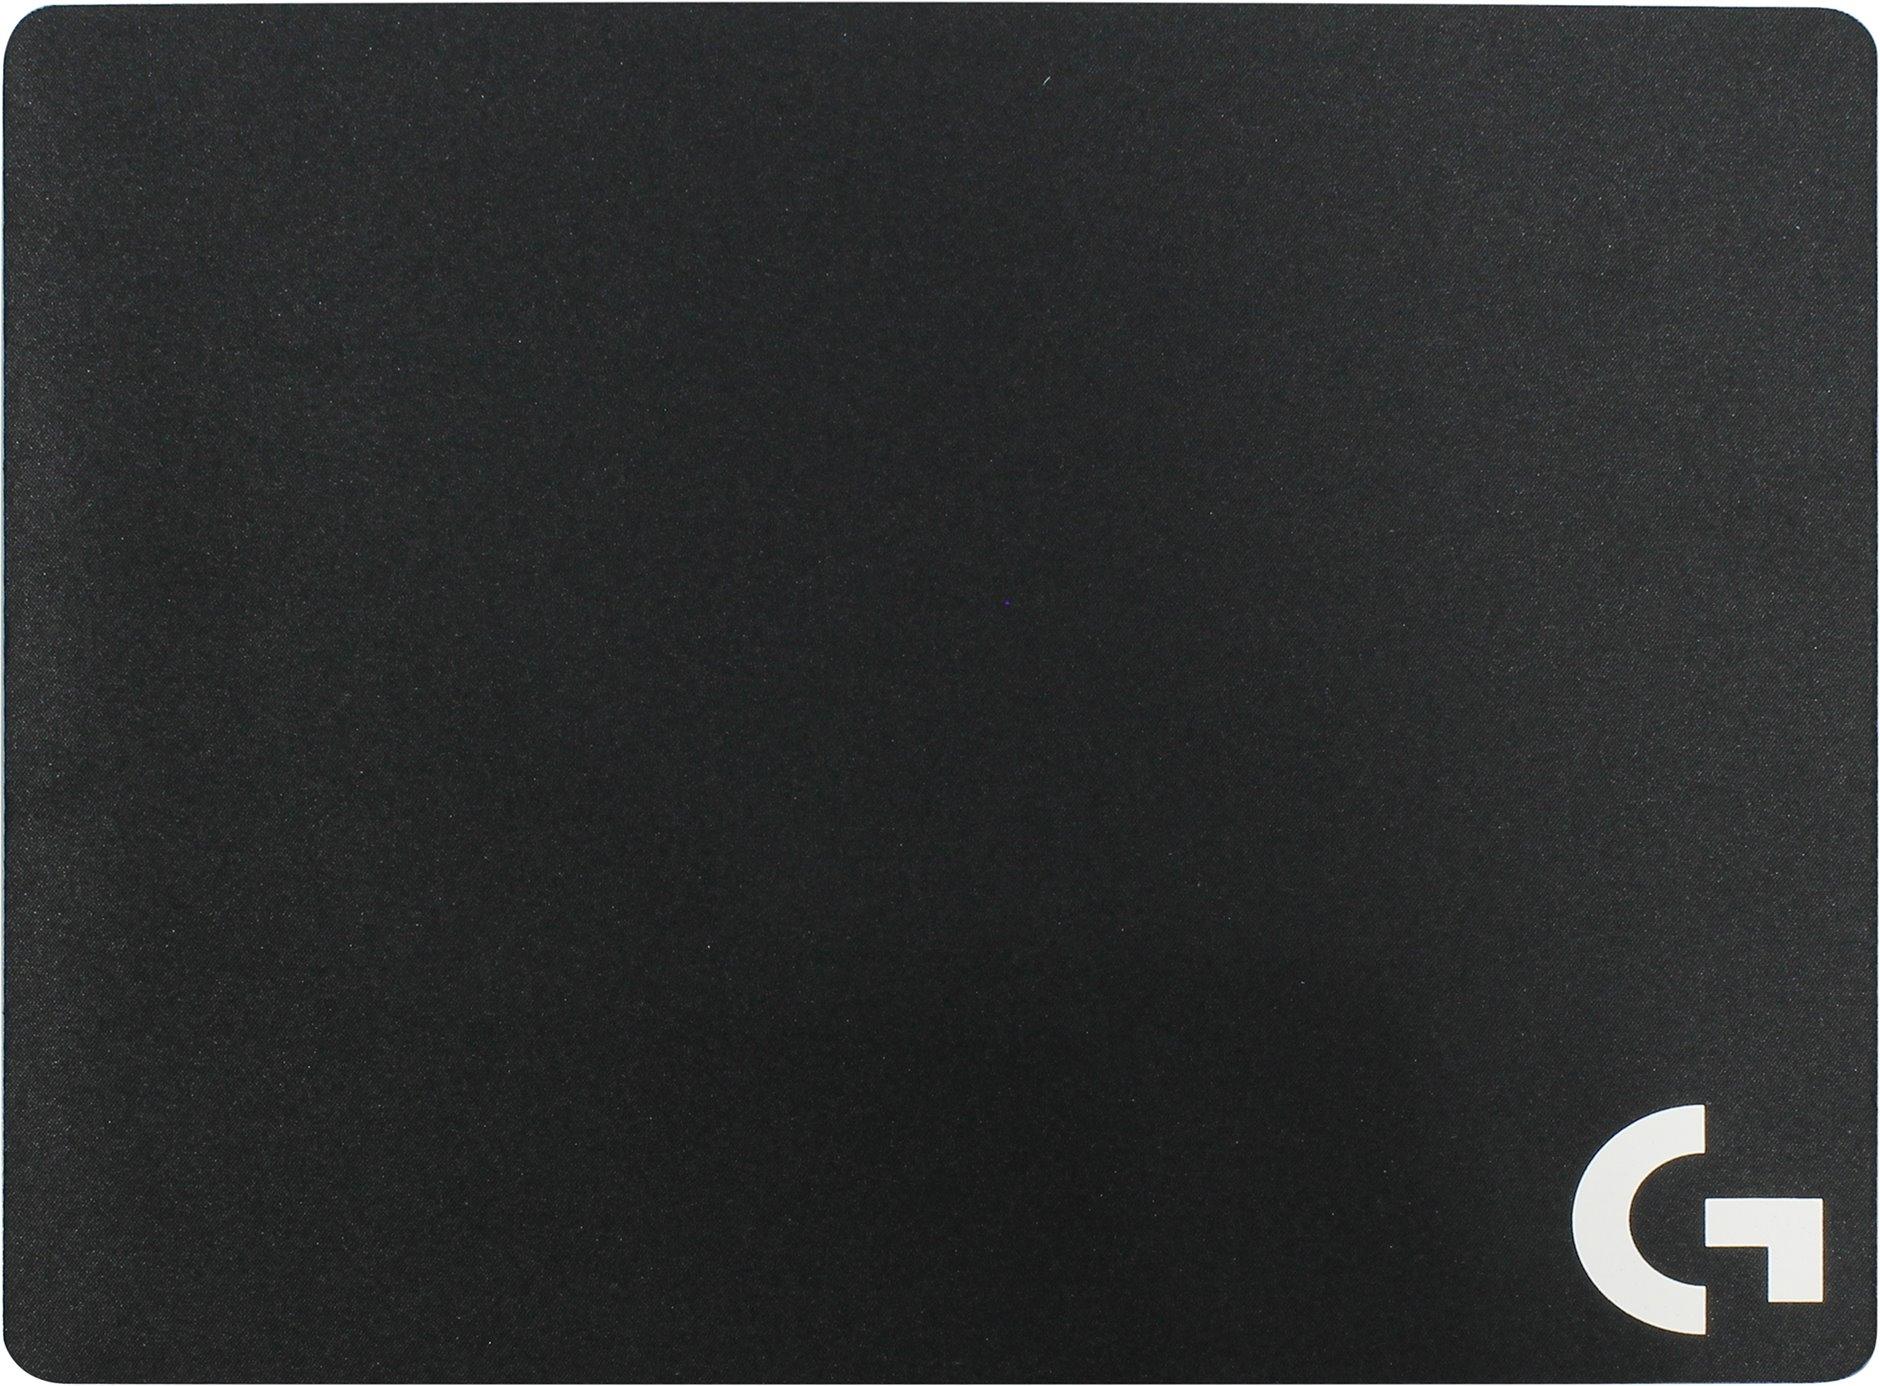 Коврик для мыши Logitech G240 Cloth Gaming Mouse Pad